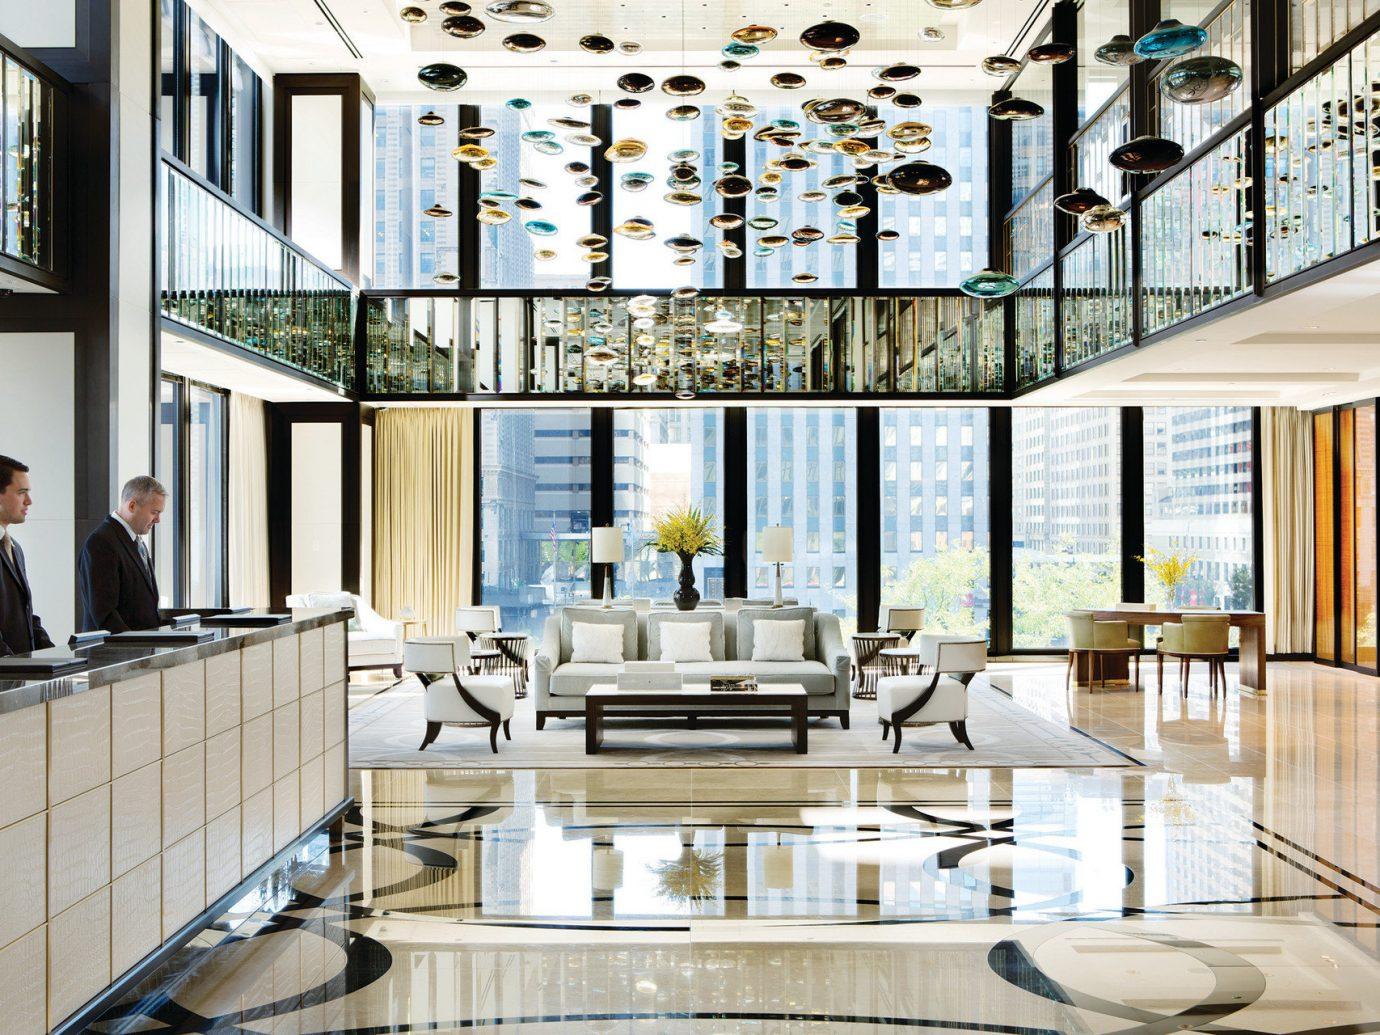 Hotels indoor room property window floor home interior design condominium estate living room Lobby daylighting Design